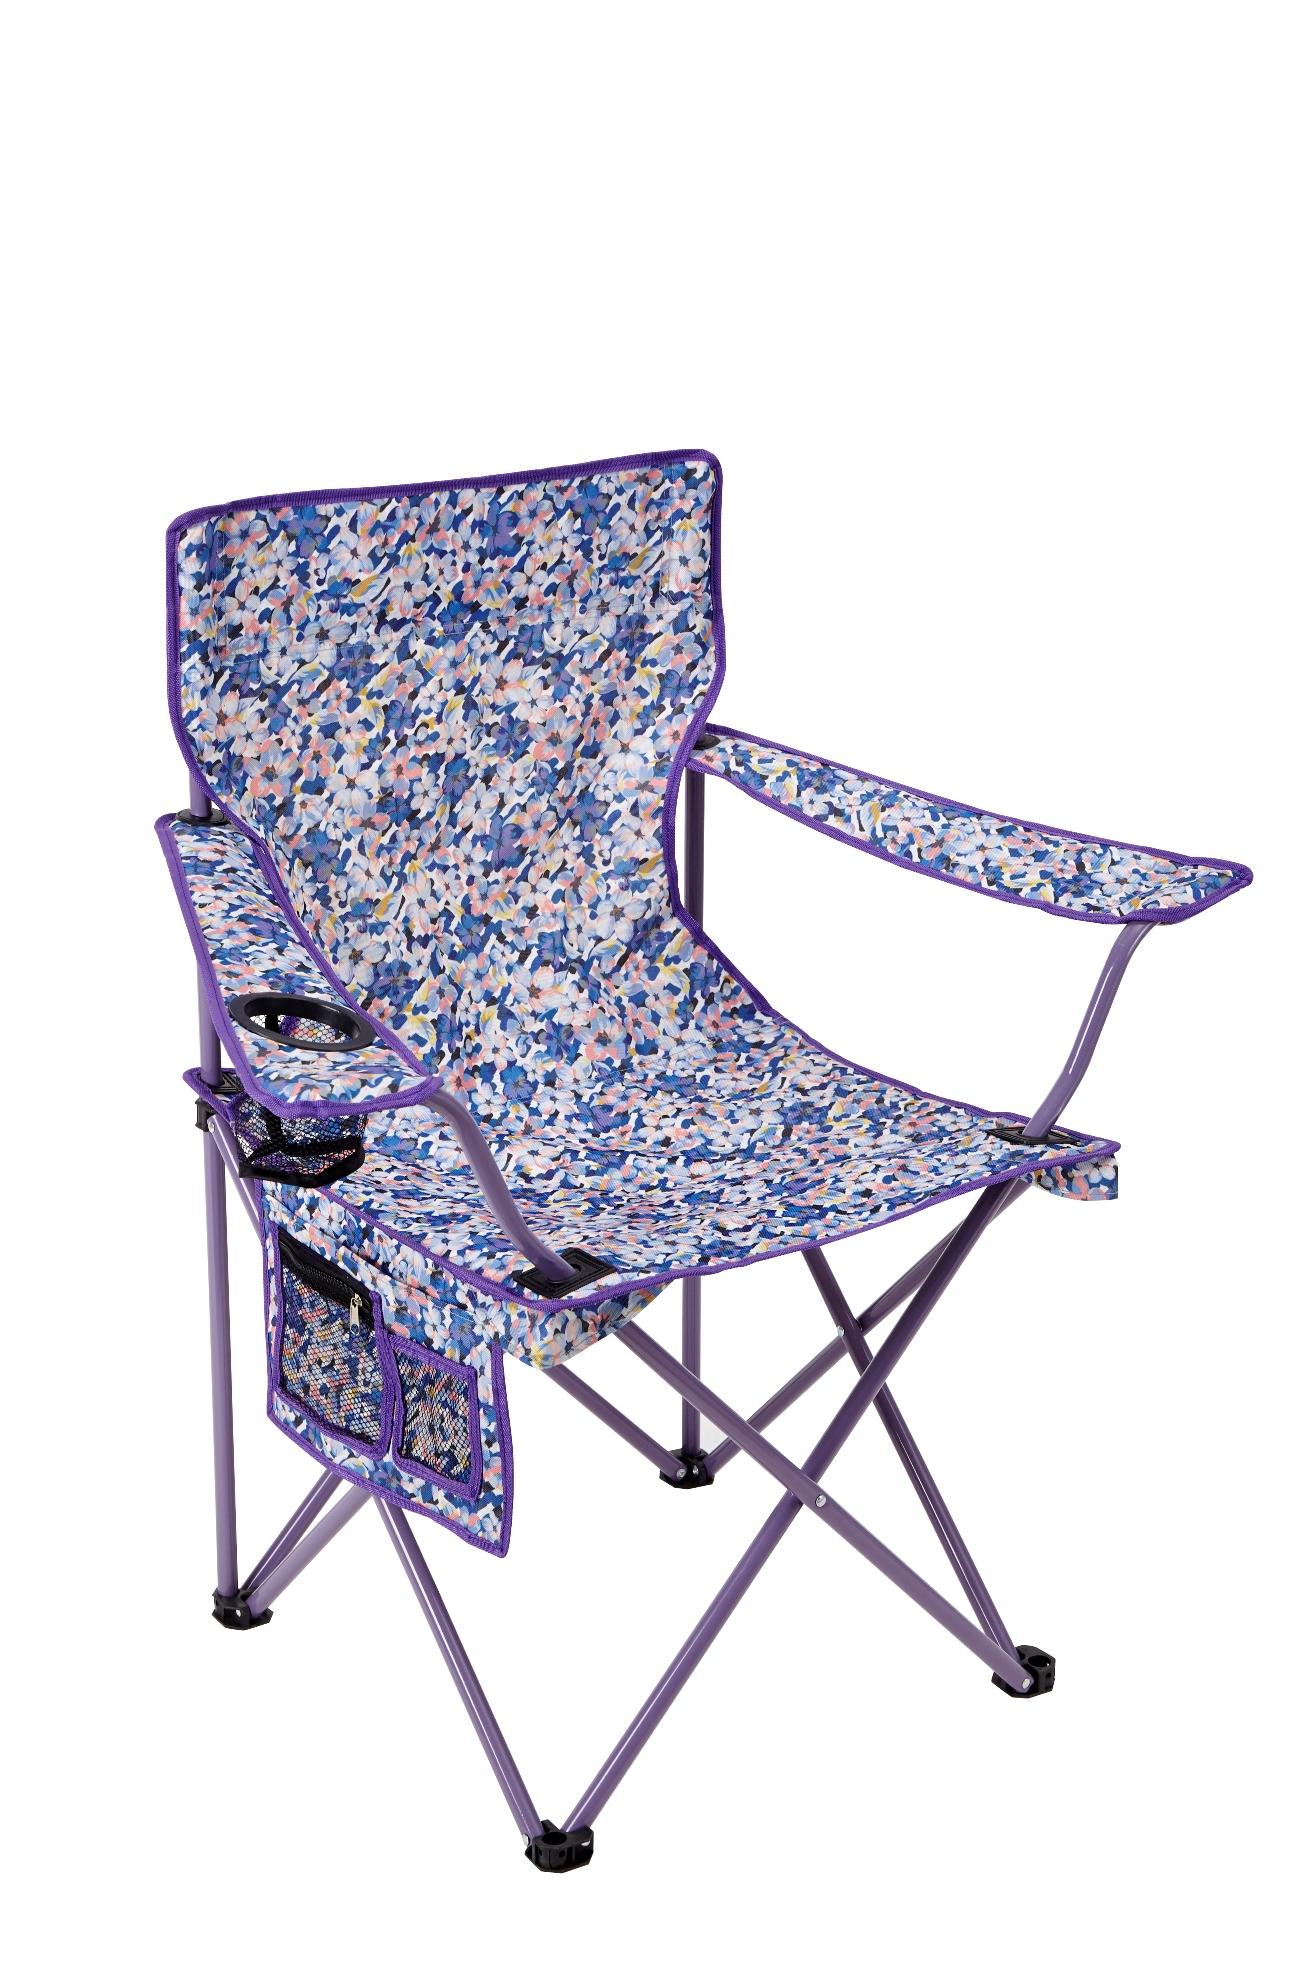 Northwest Territory Fashion Chair - Purple